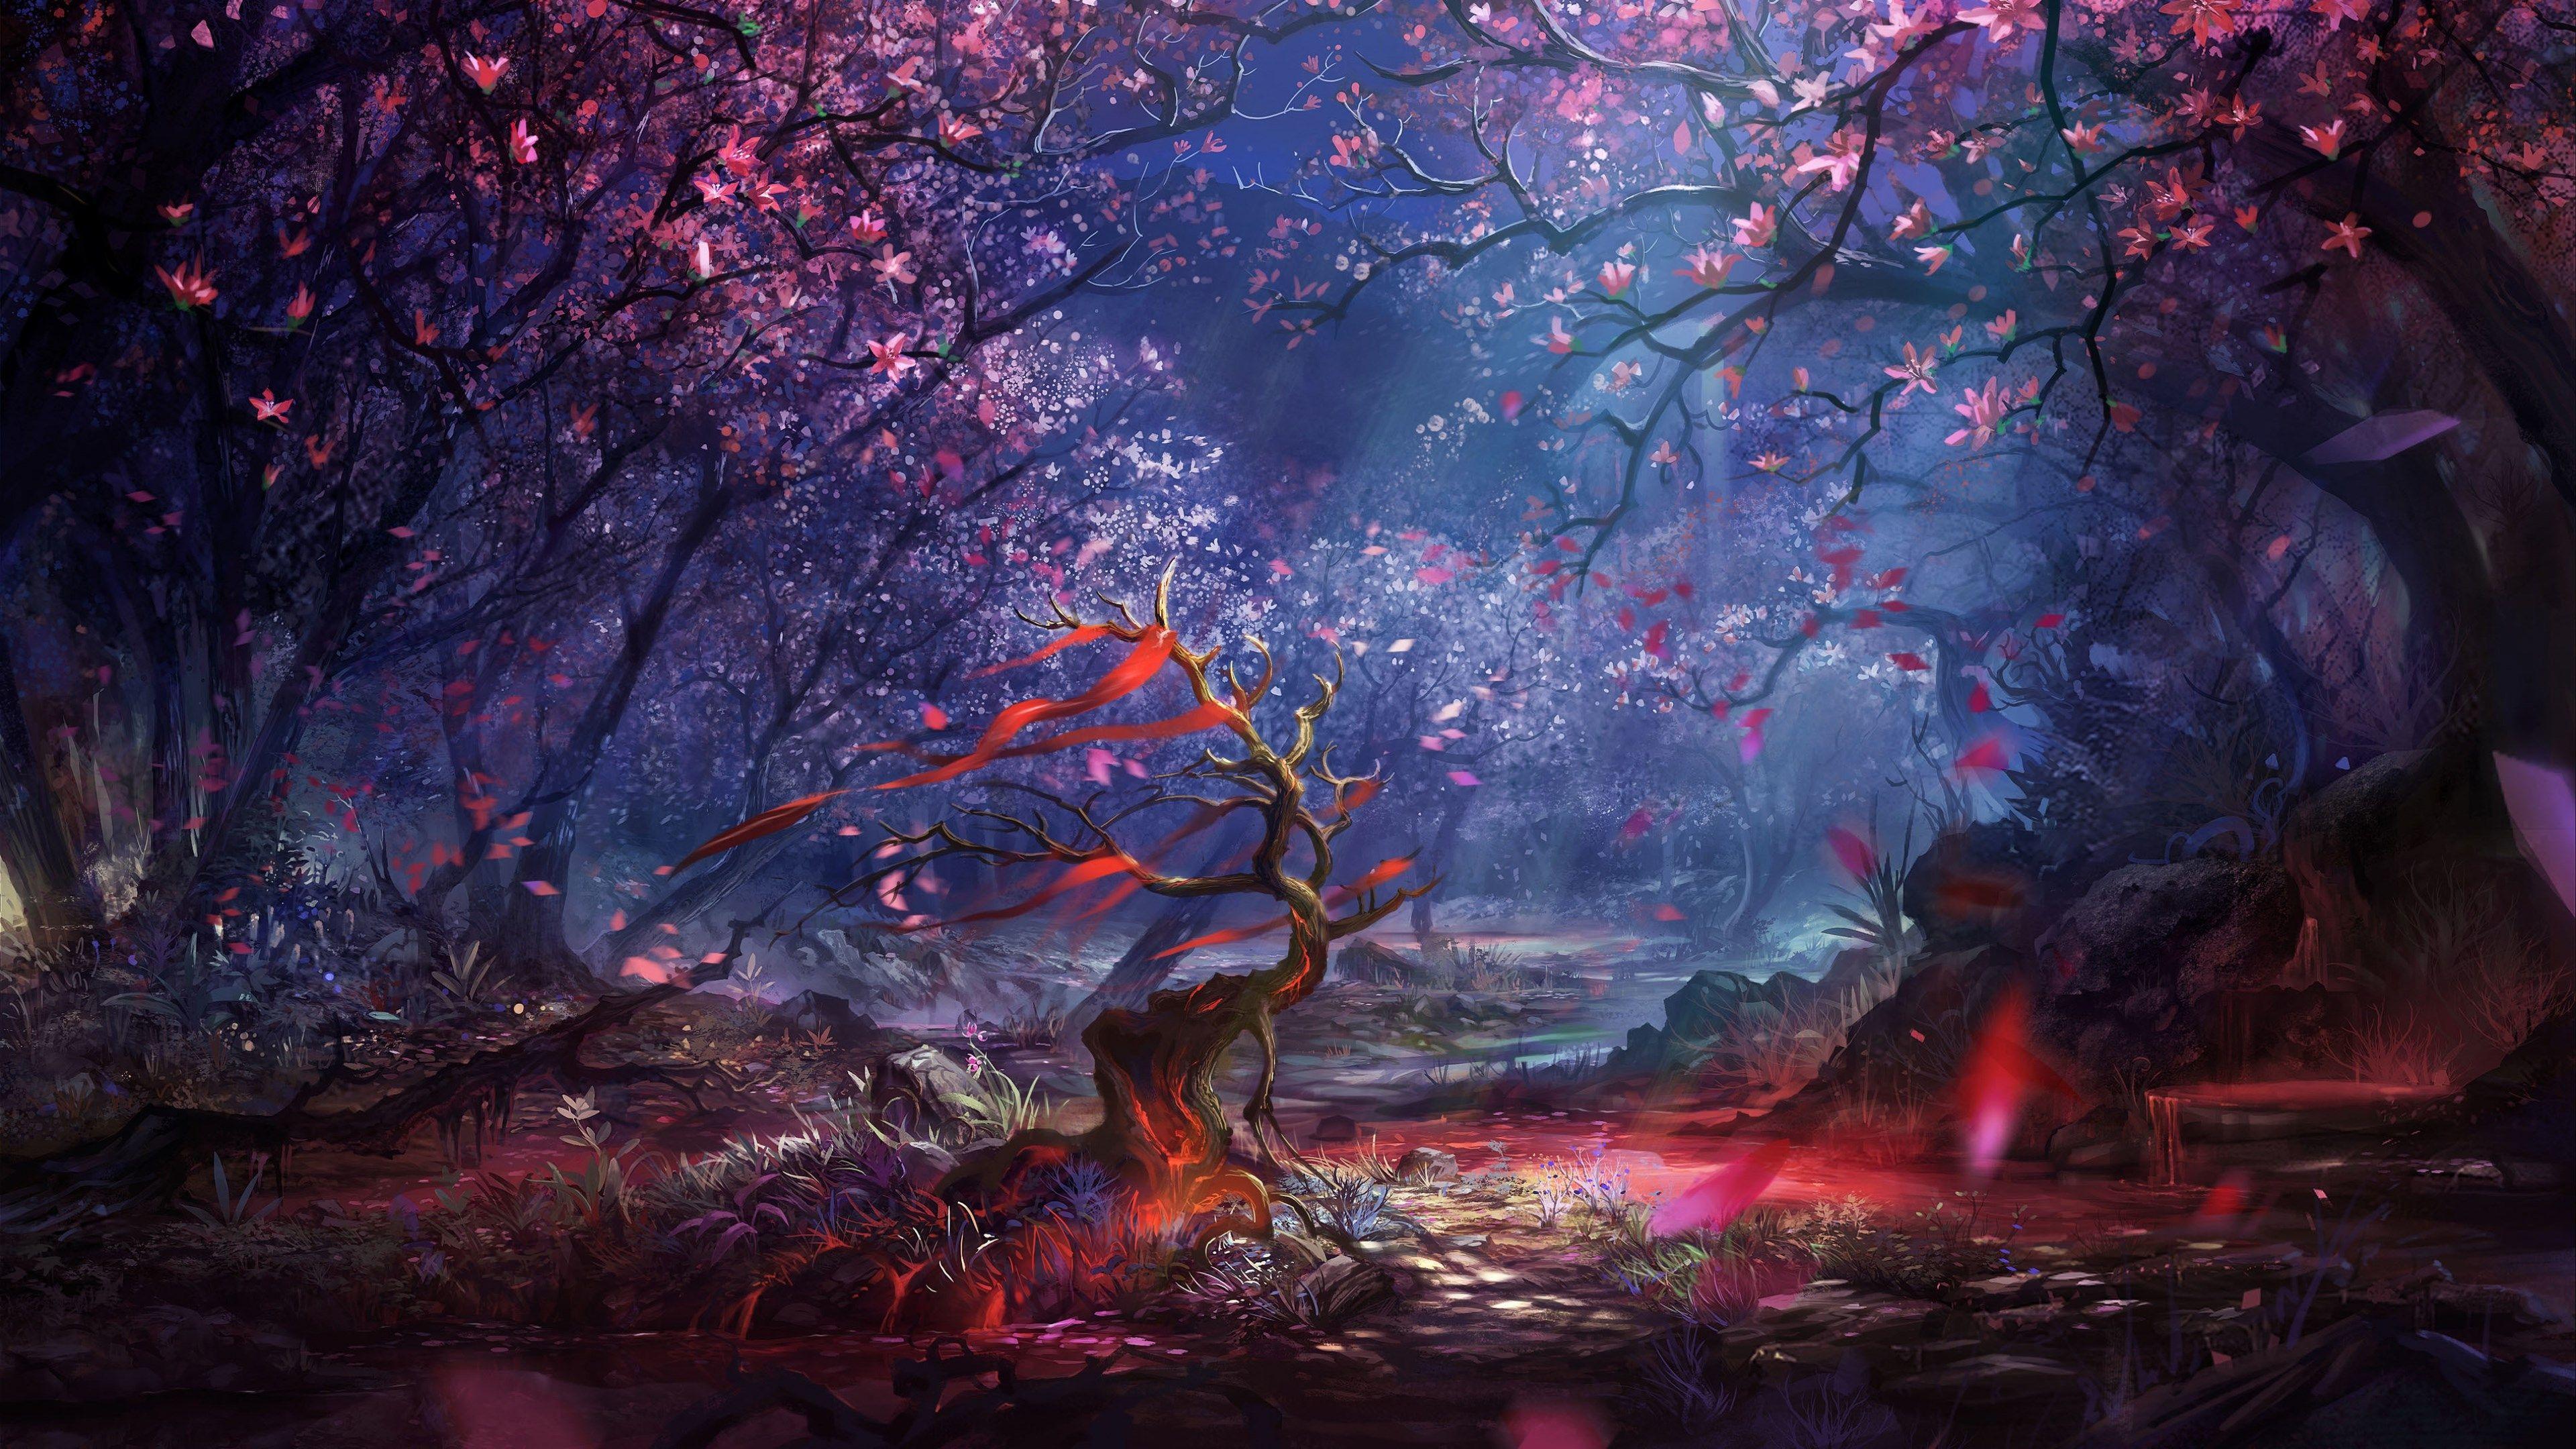 Beautiful Forest Art Hd Wallpaper Fantasy Landscape Fantasy Art Landscapes Fantasy Forest